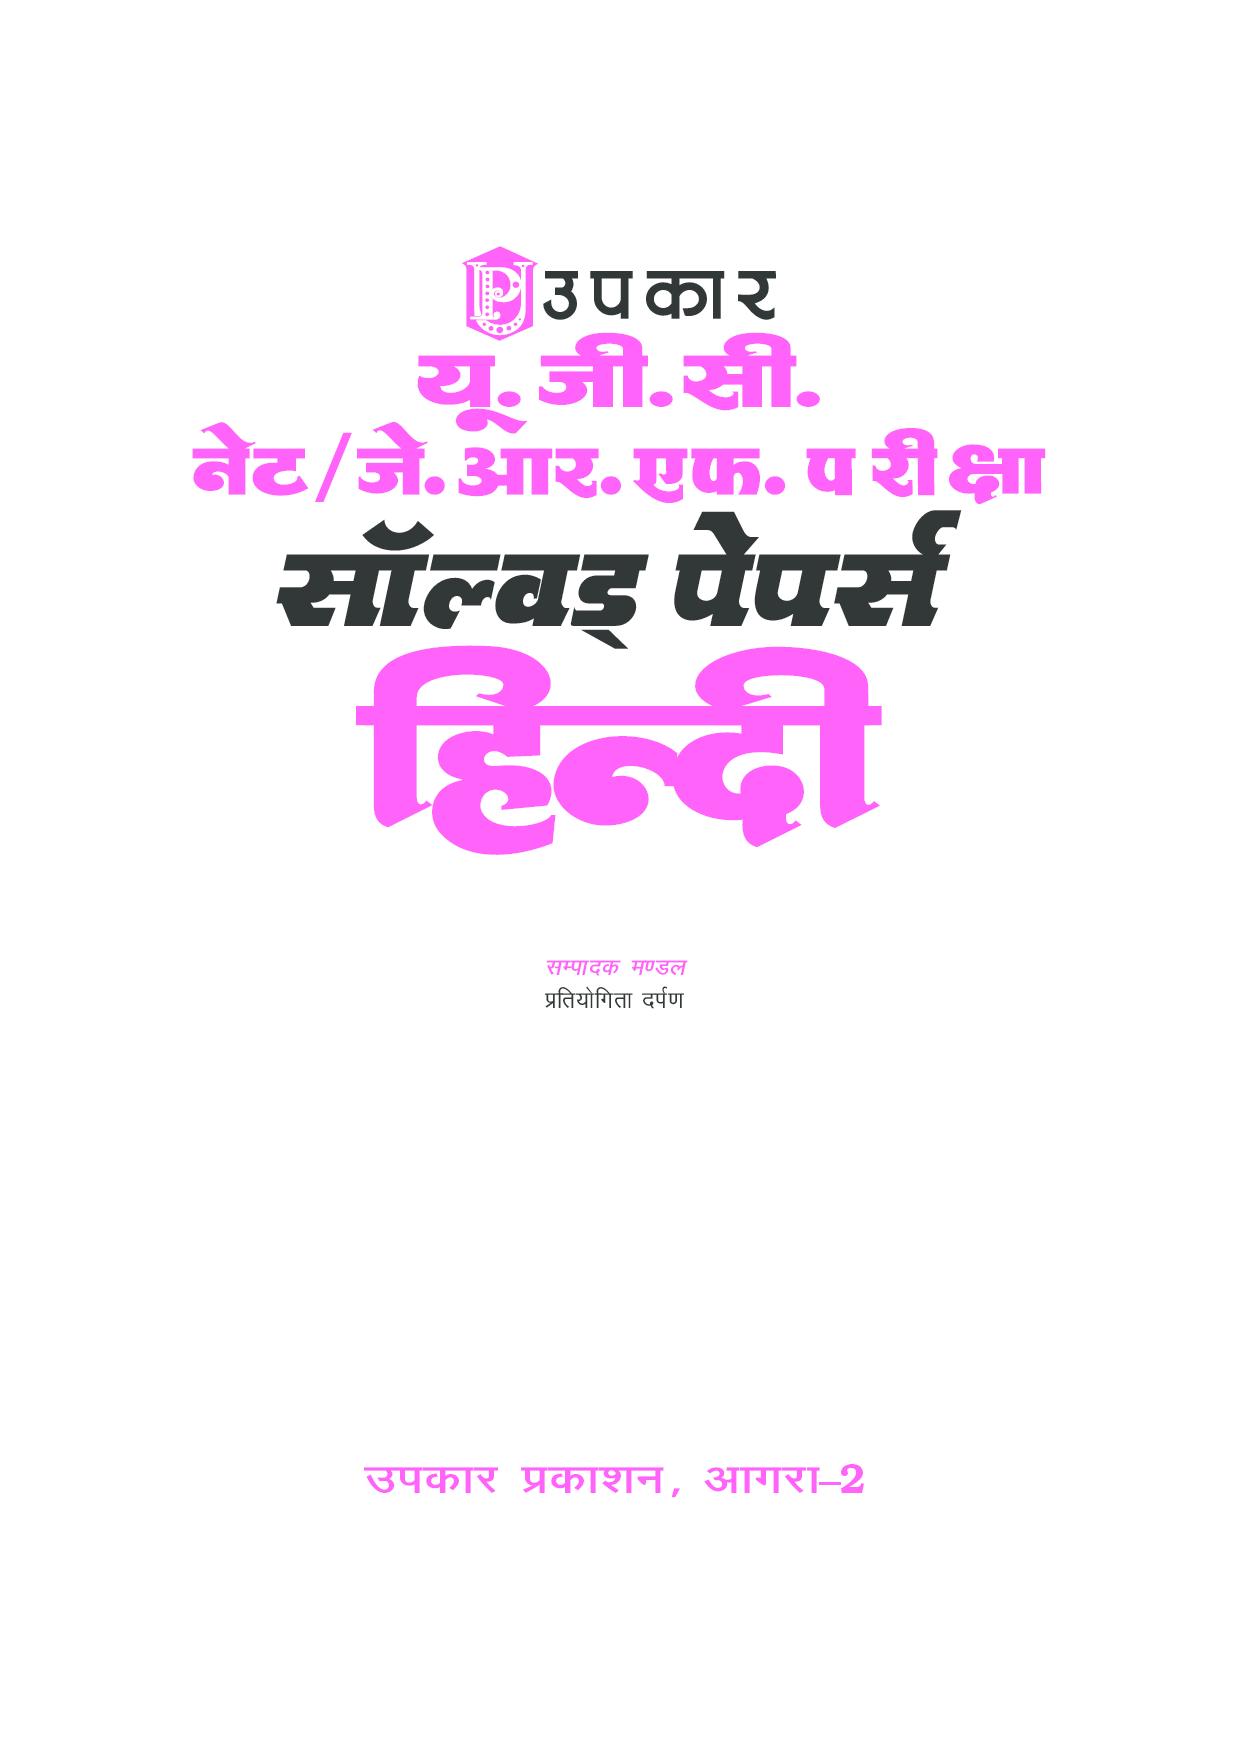 U.G.C. NET/J.R.F. परीक्षा साल्व्ड पेपर हिंदी   - Page 2